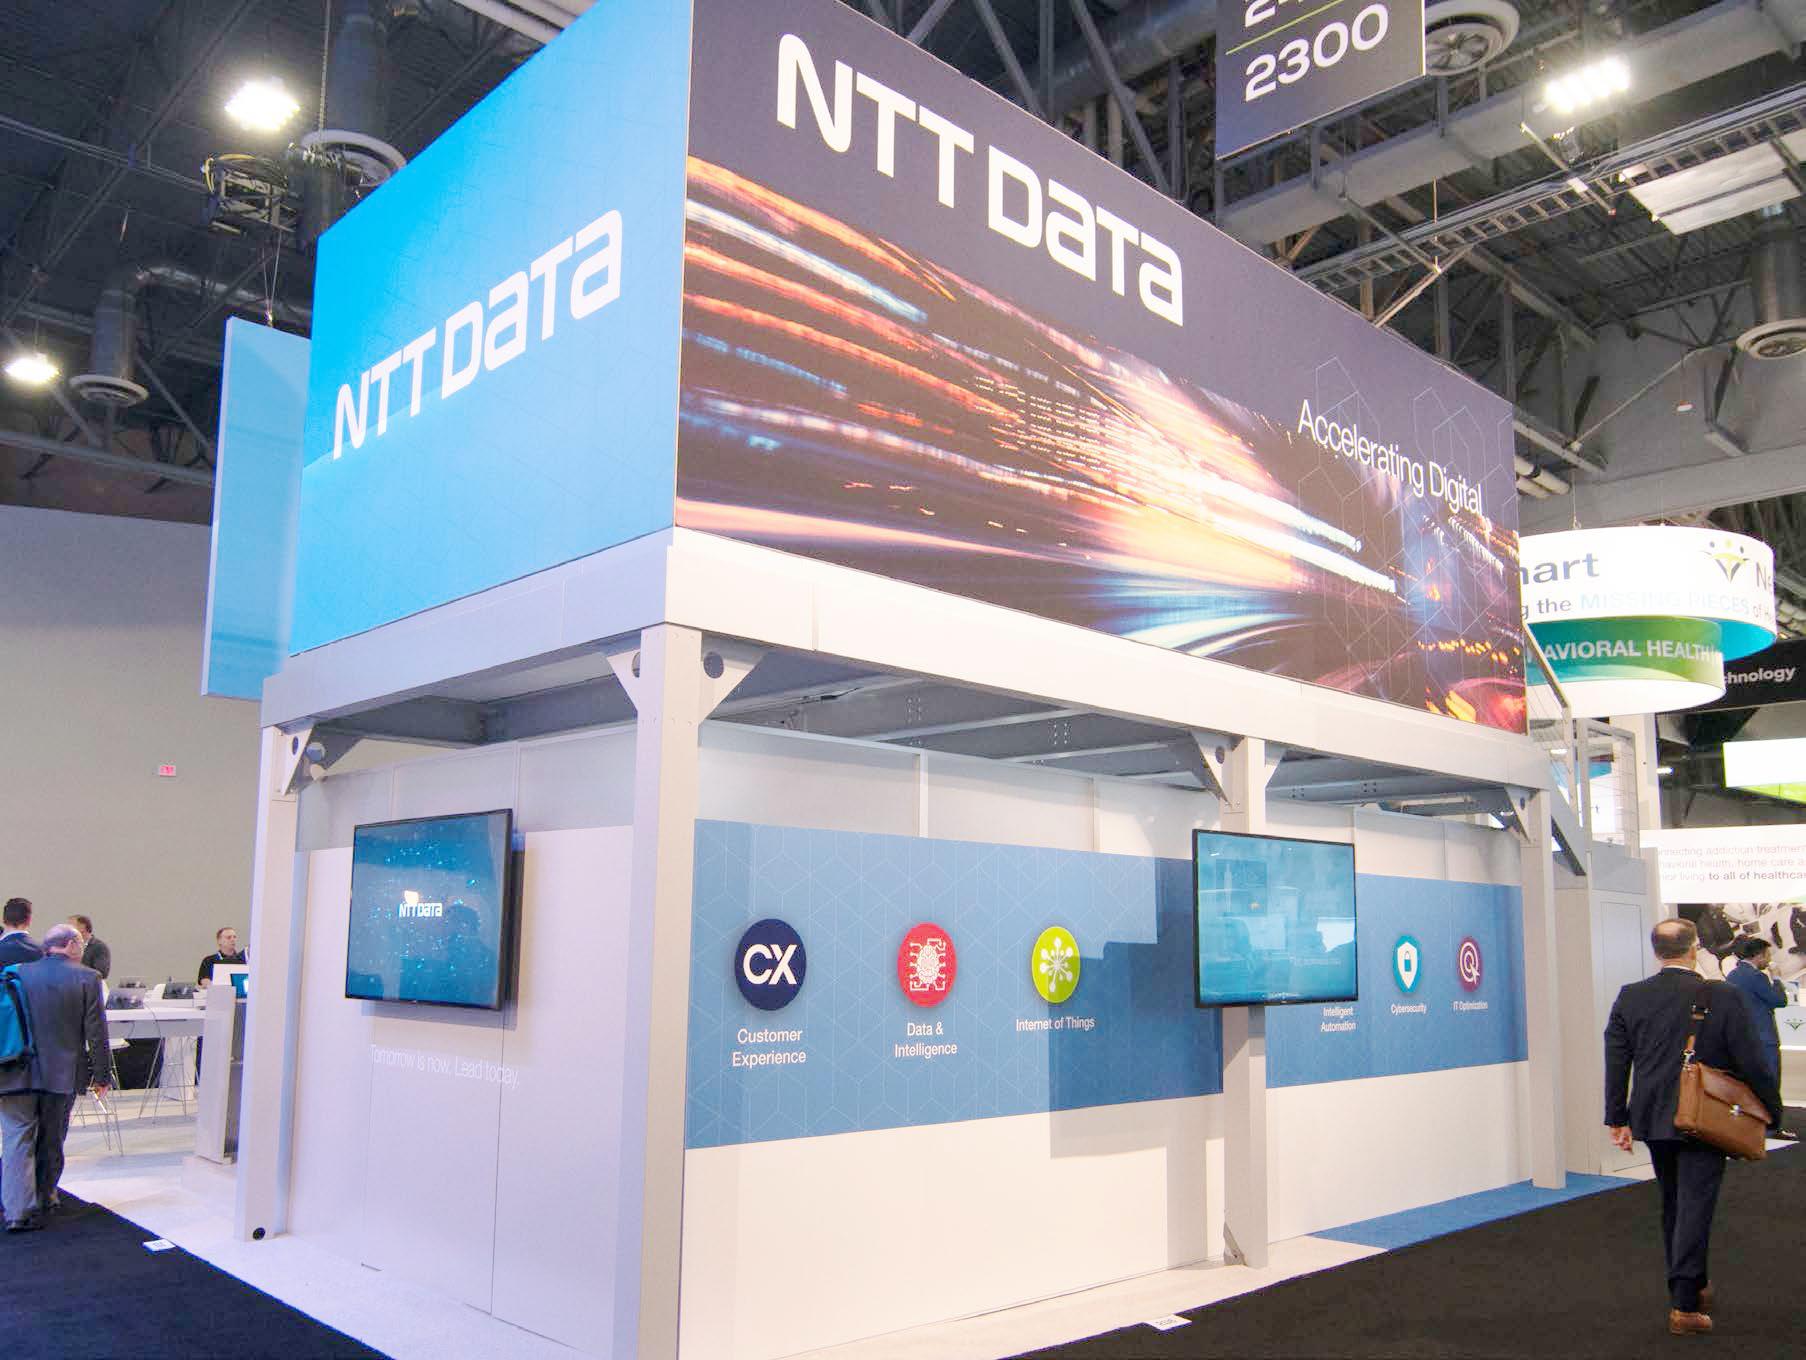 NTT_DATA_system_rules_r5_051518 12.jpg